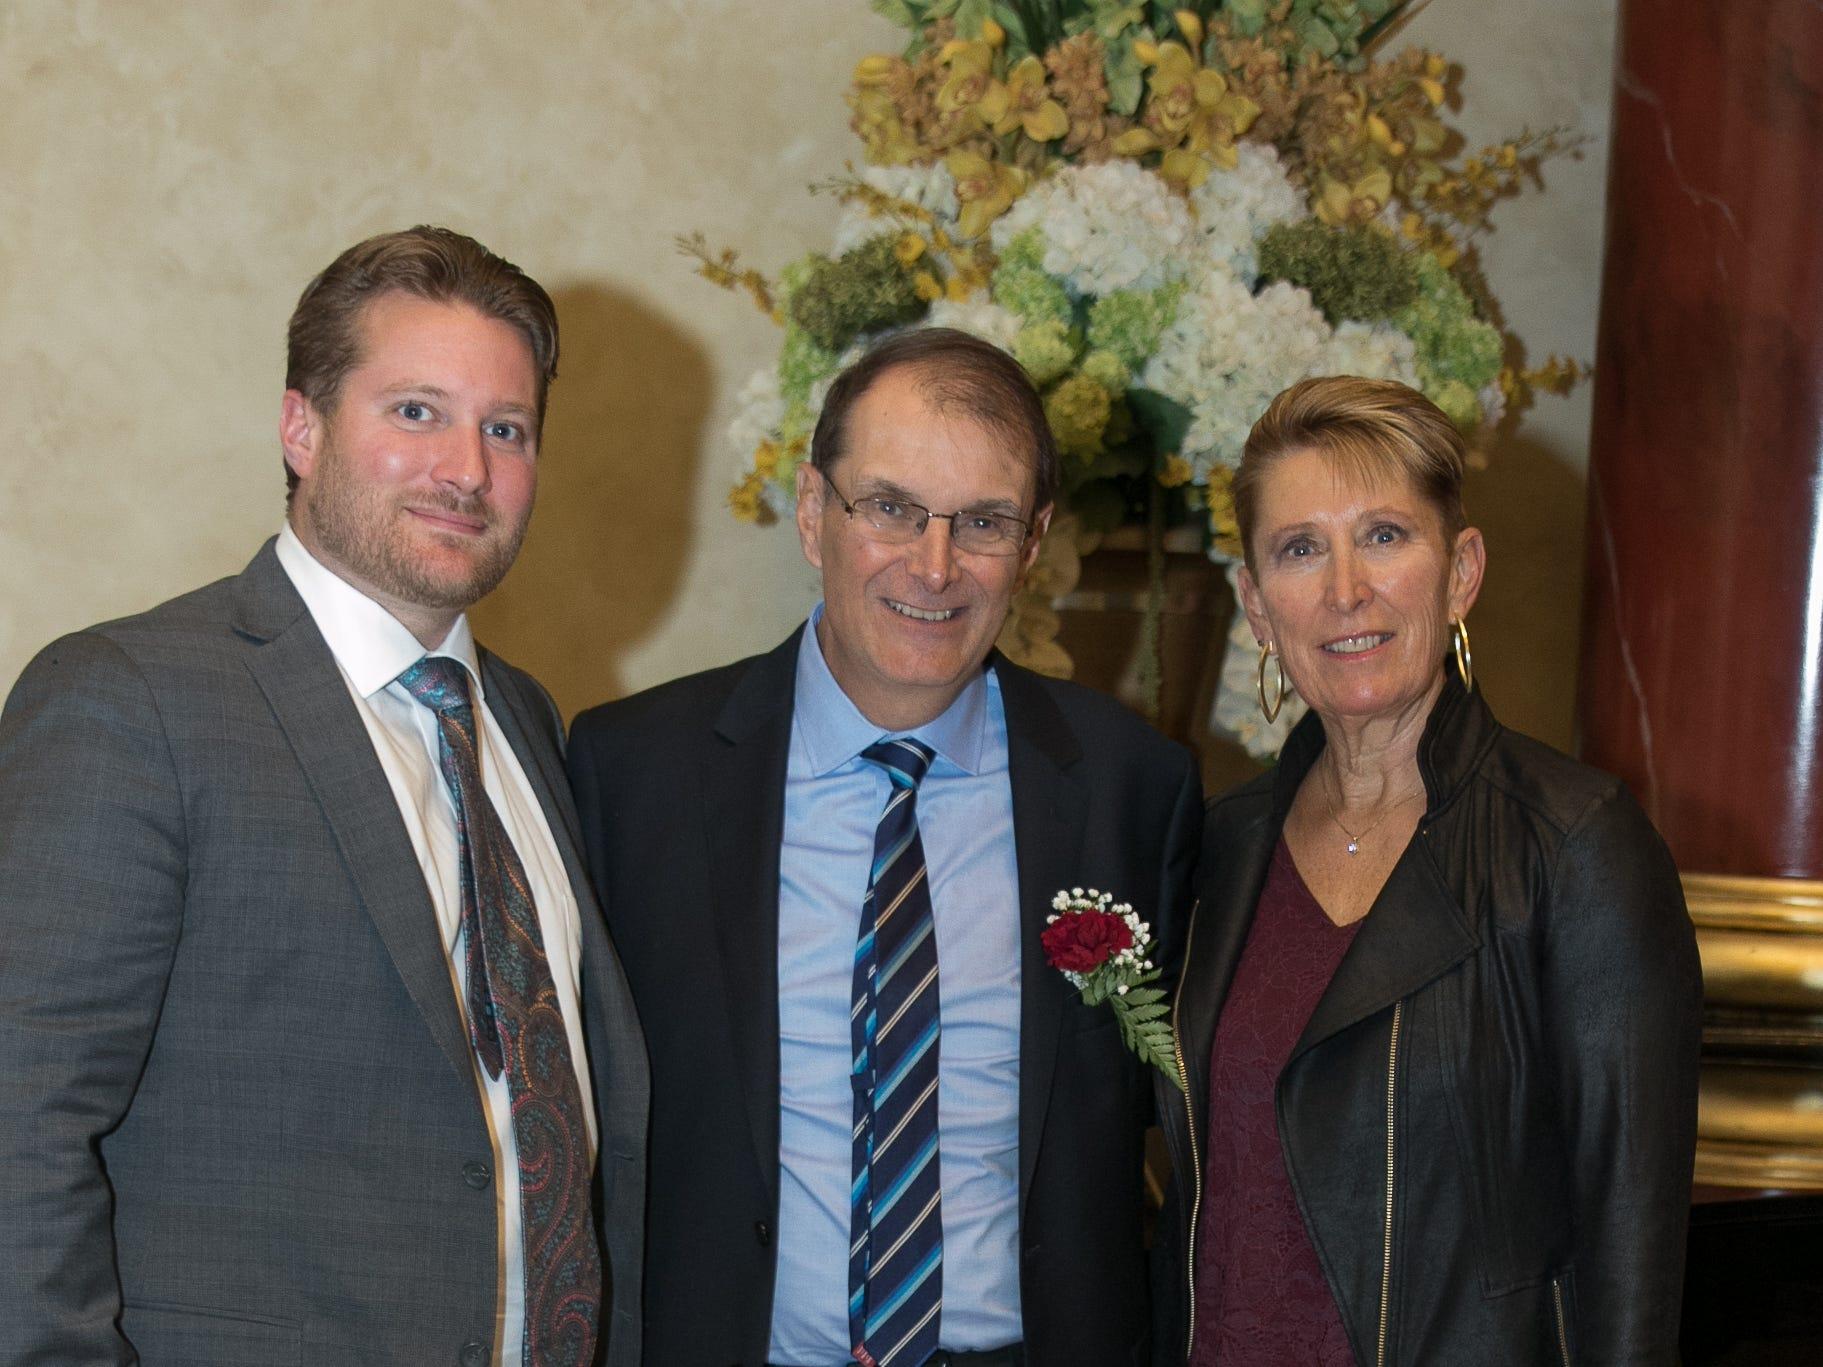 John Nepolitan and Family. Don Bosco Prep held it's 17th Annual President's Gala at The Venitian in Garfield, NJ. 10/25/2018